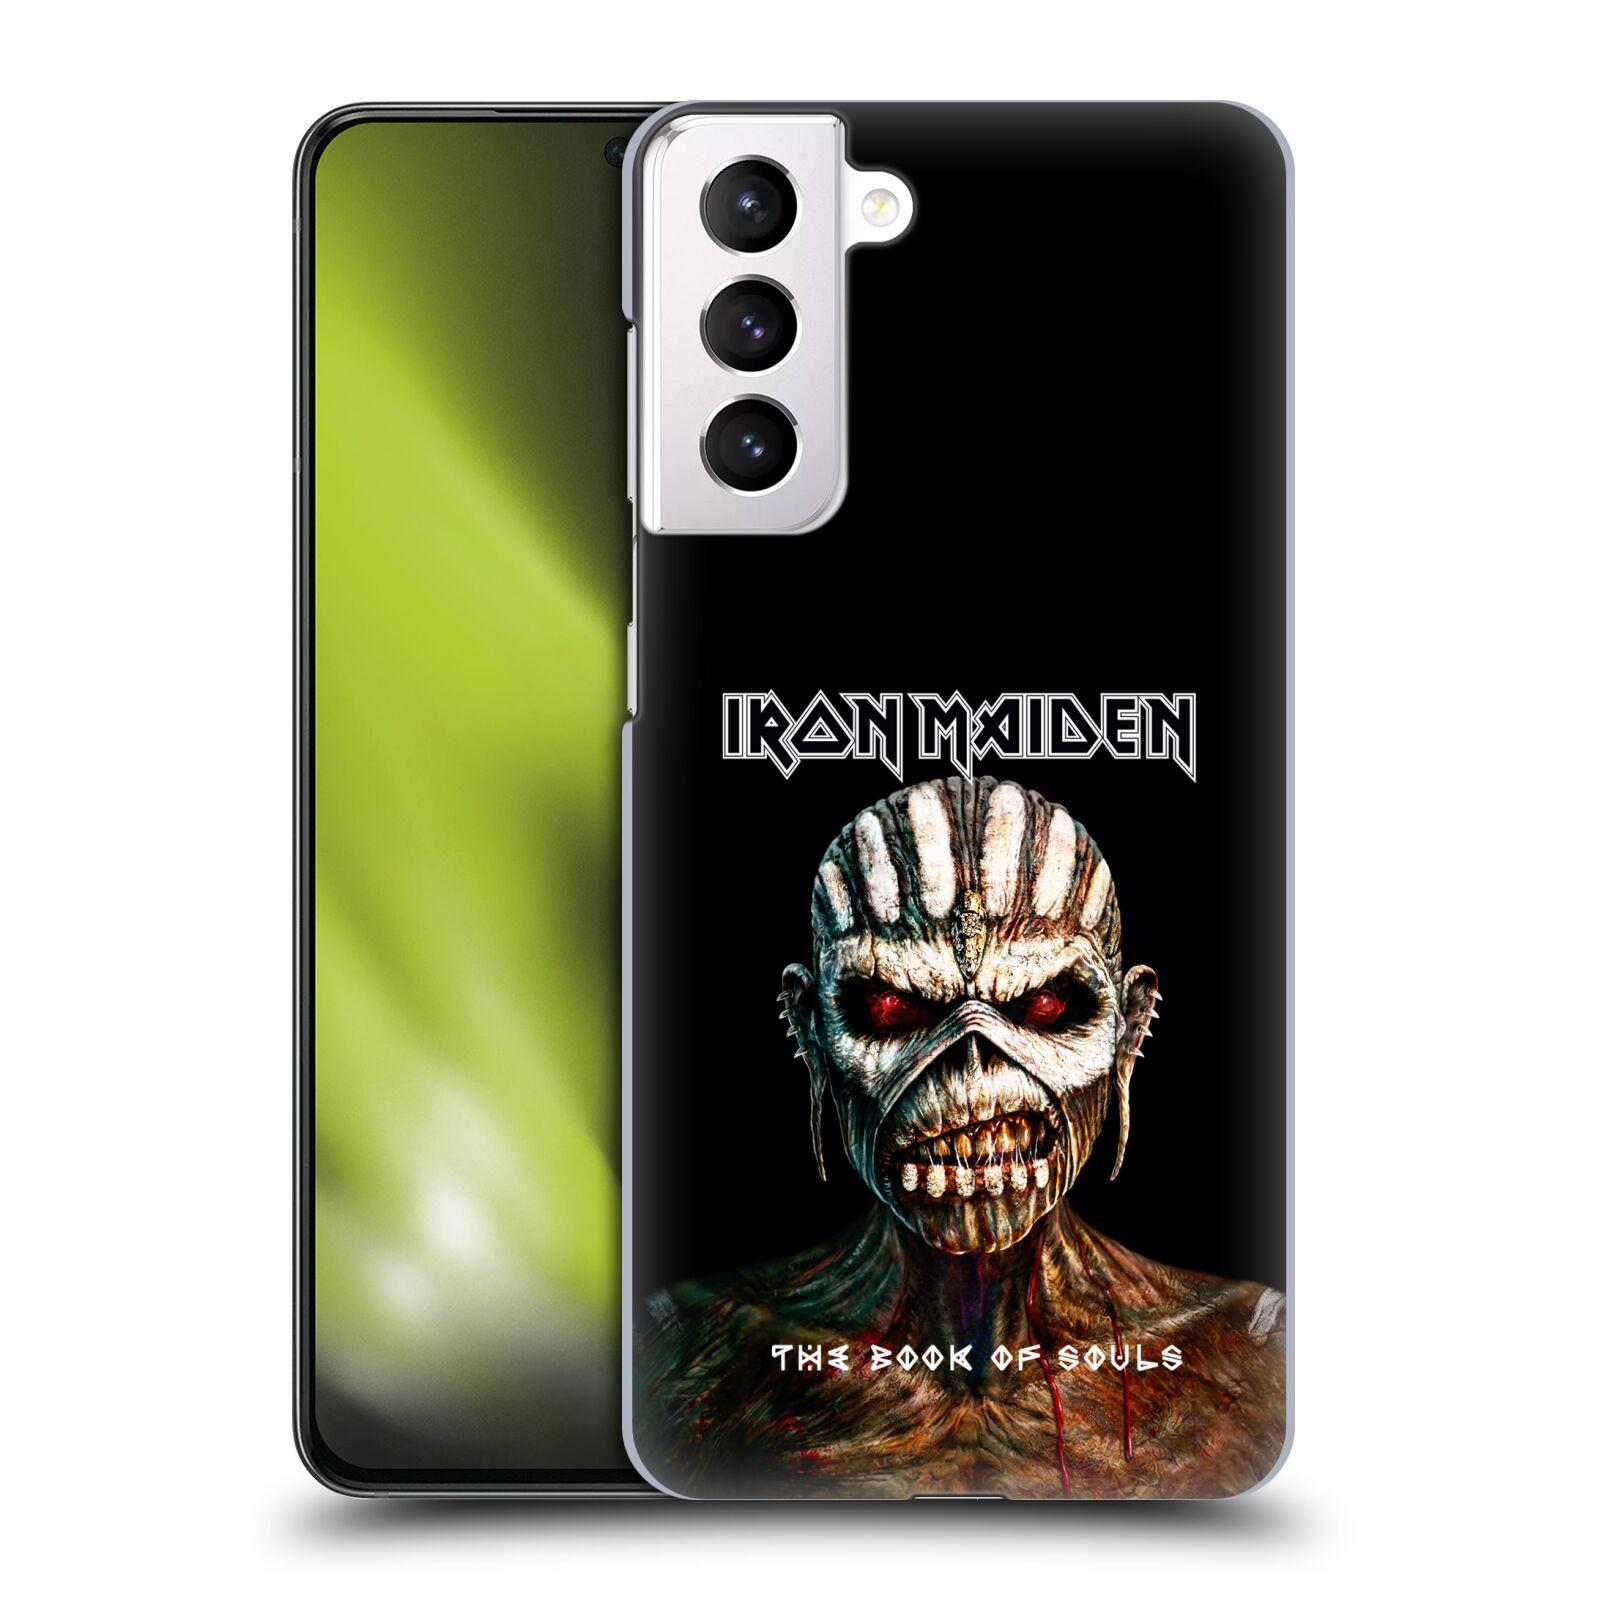 Plastové pouzdro na mobil Samsung Galaxy S21 Plus 5G - Head Case - Iron Maiden - The Book Of Souls